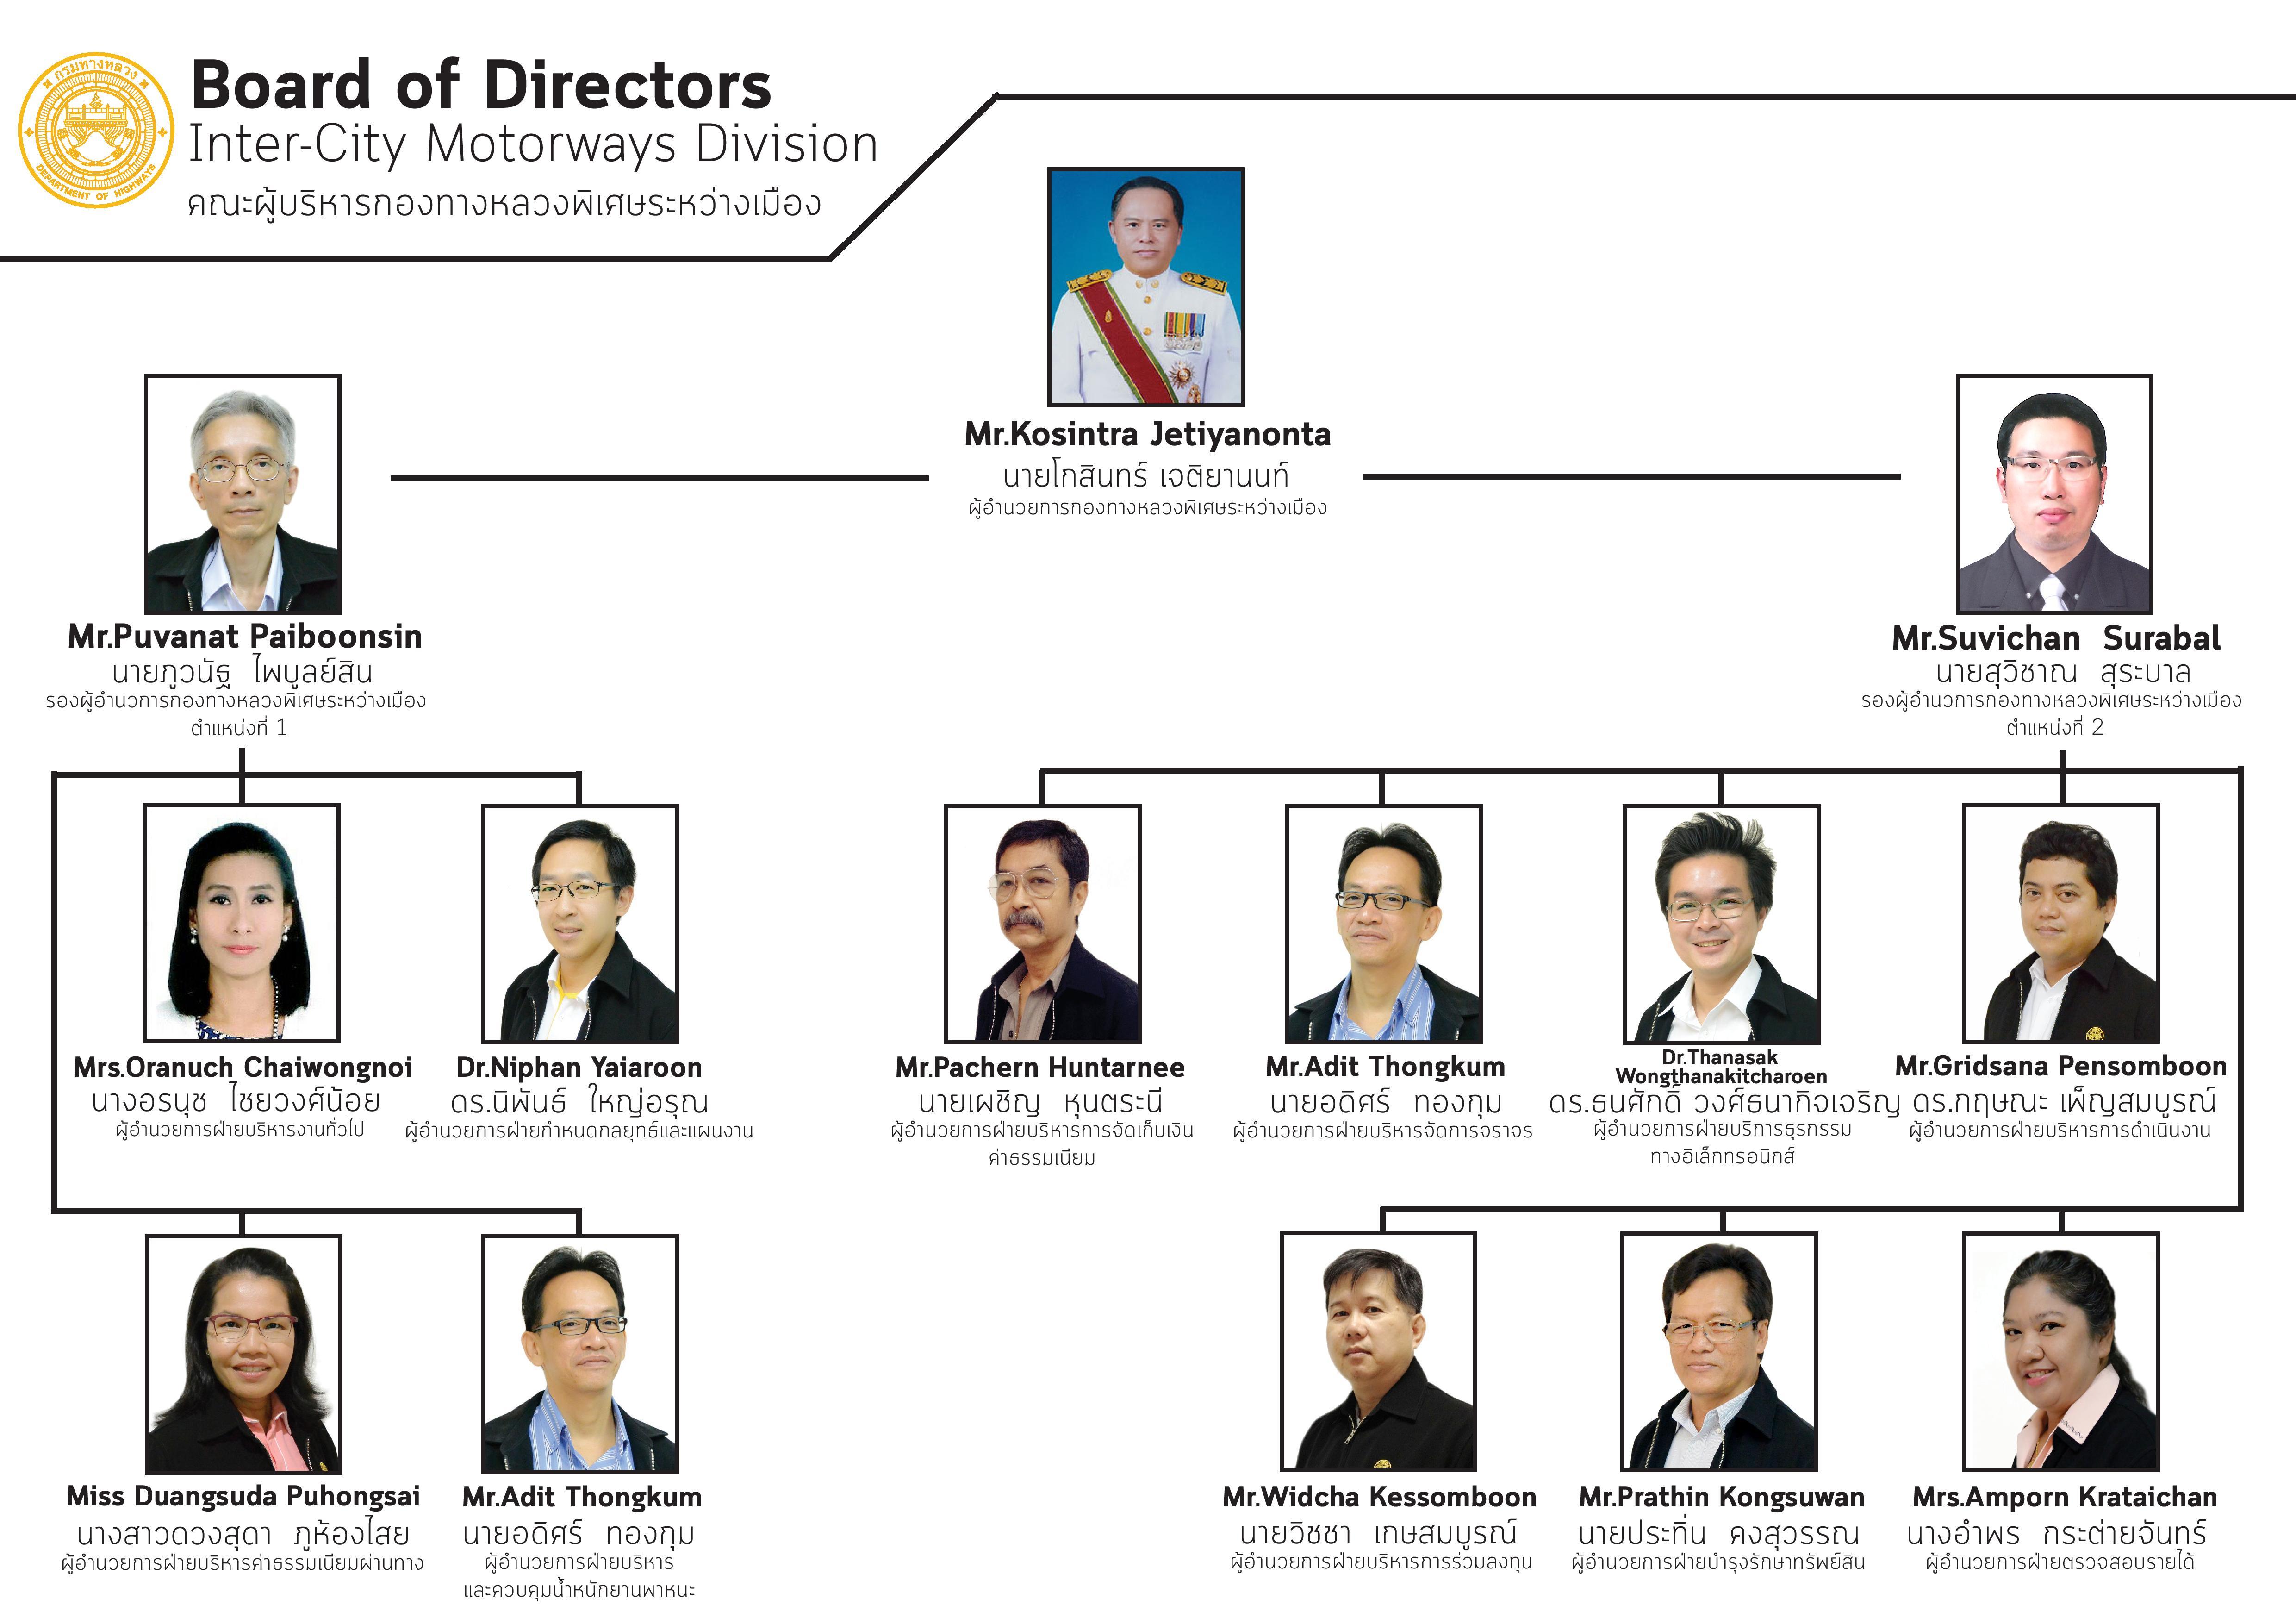 board-of-directors-1-page-001